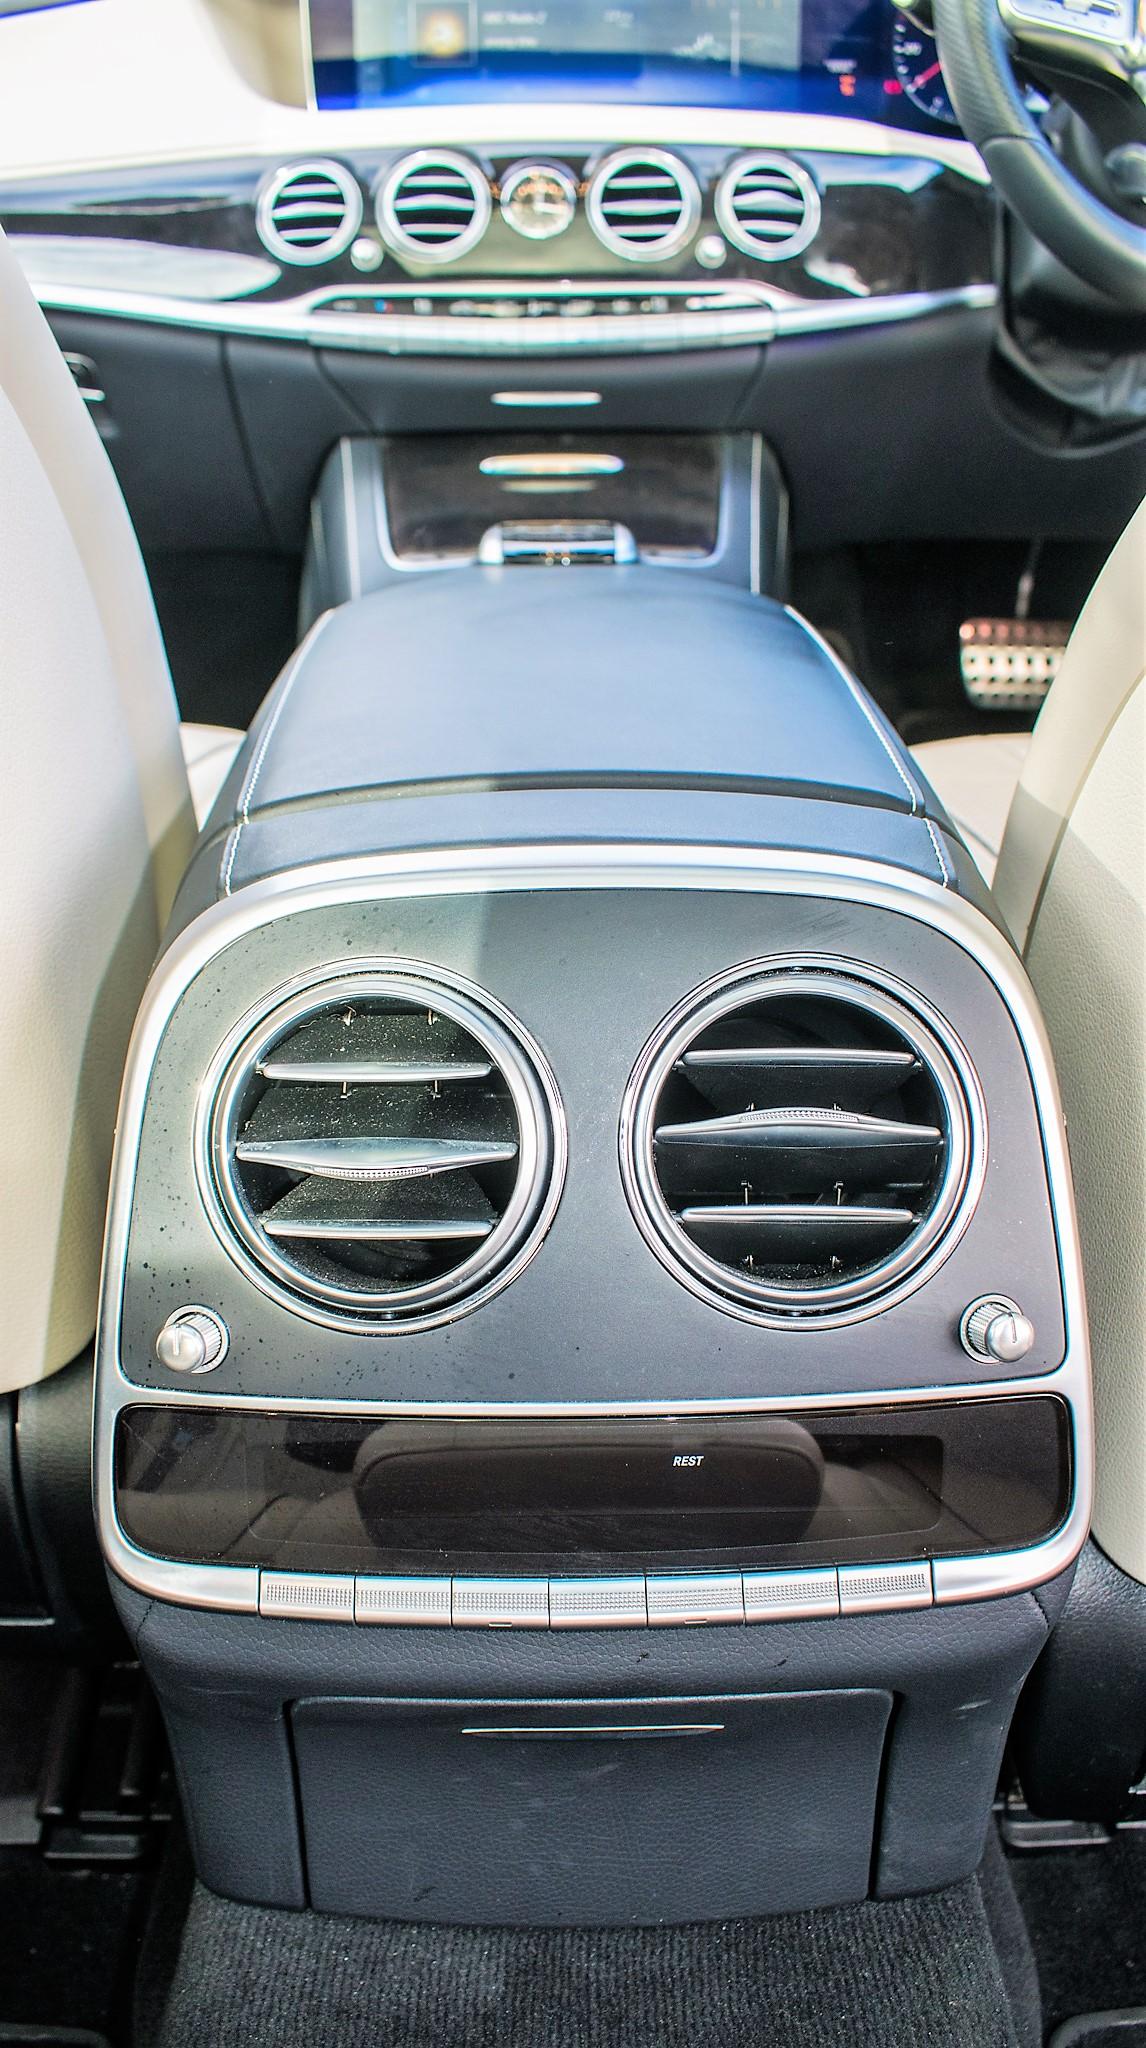 Mercedes Benz S450 L AMG Line Executive auto petrol 4 door saloon car Registration Number: FX68 - Image 28 of 30